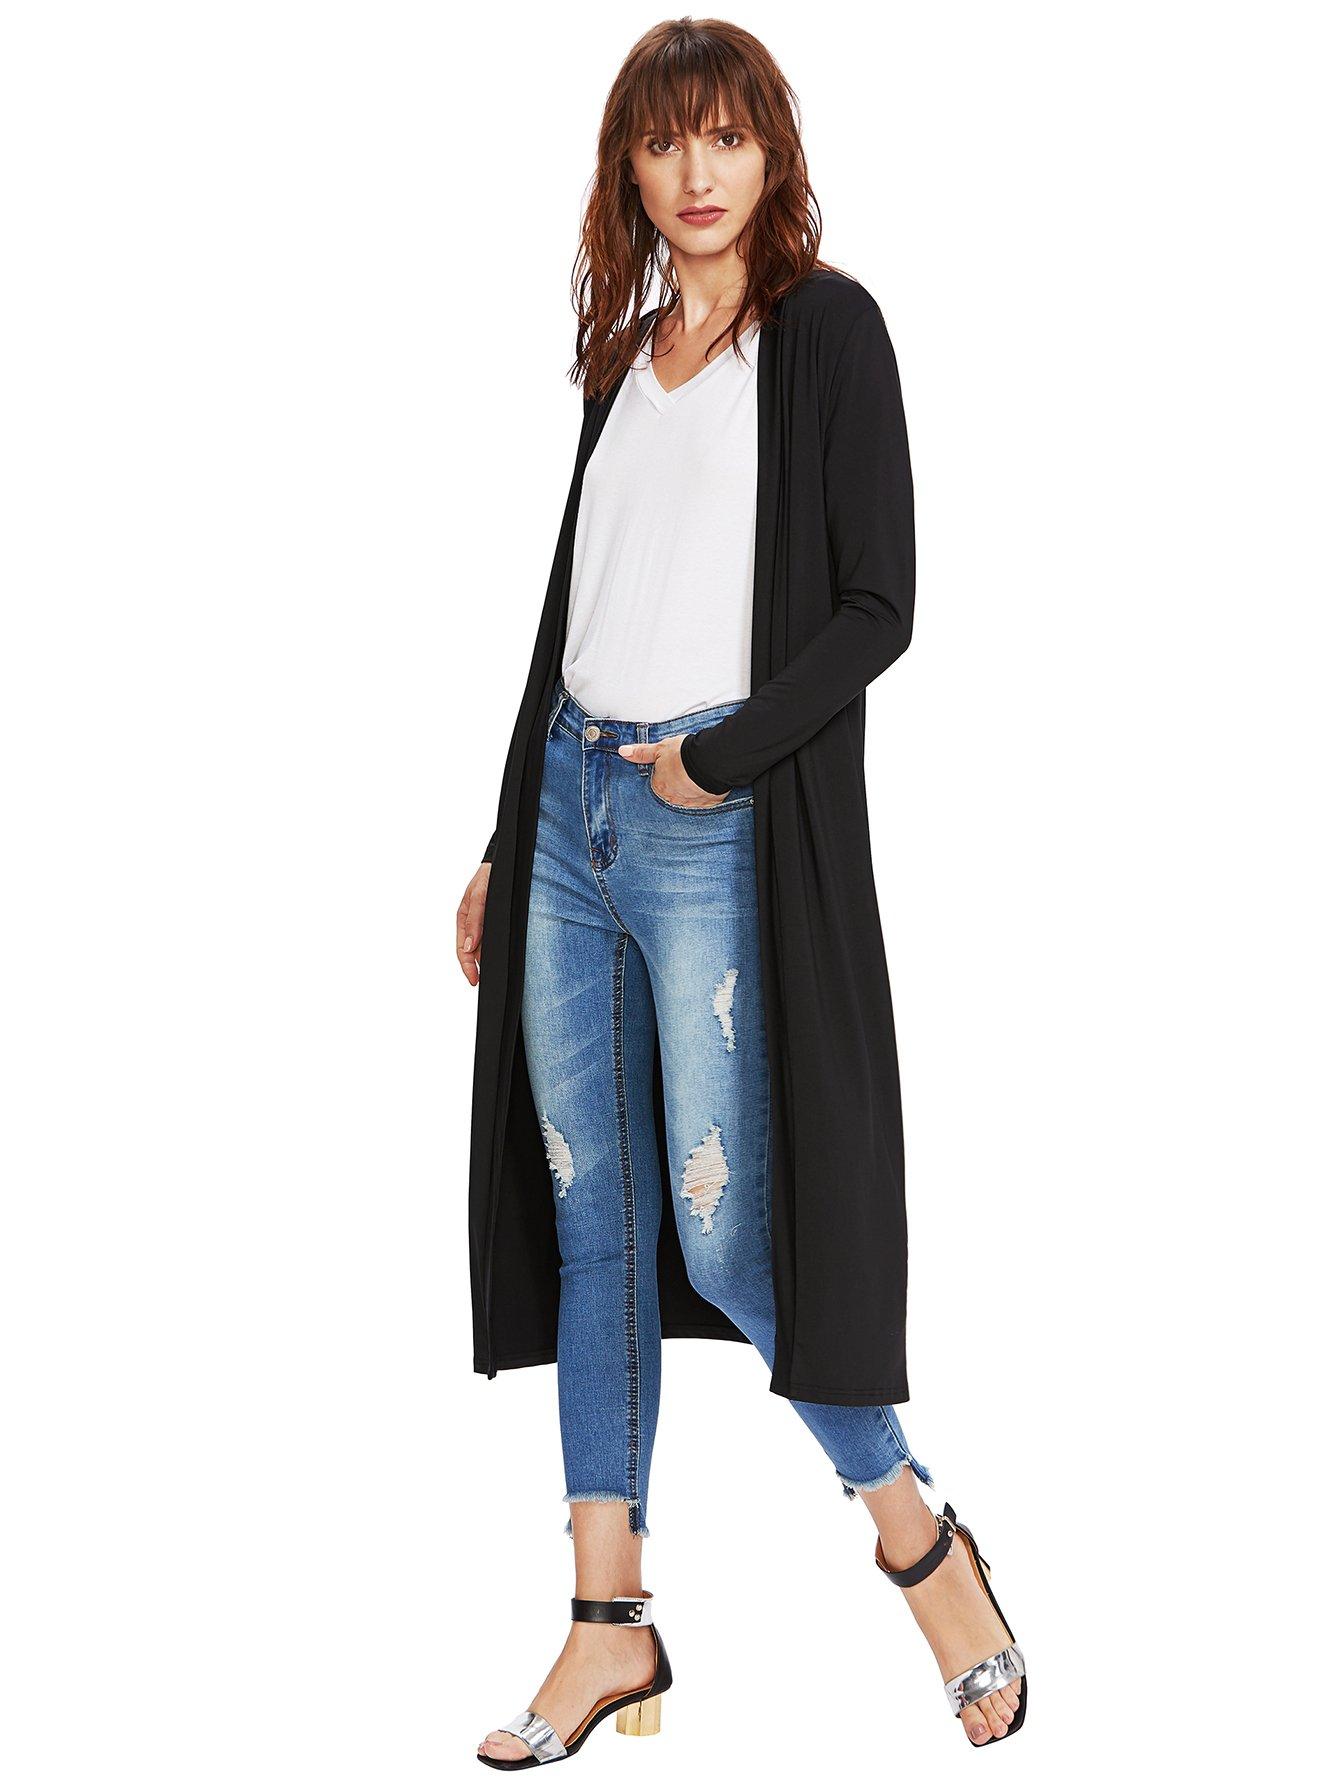 Verdusa Women's Long Sleeve Open Front Long Maxi Cardigan Longline Duster Coat Black M by Verdusa (Image #3)